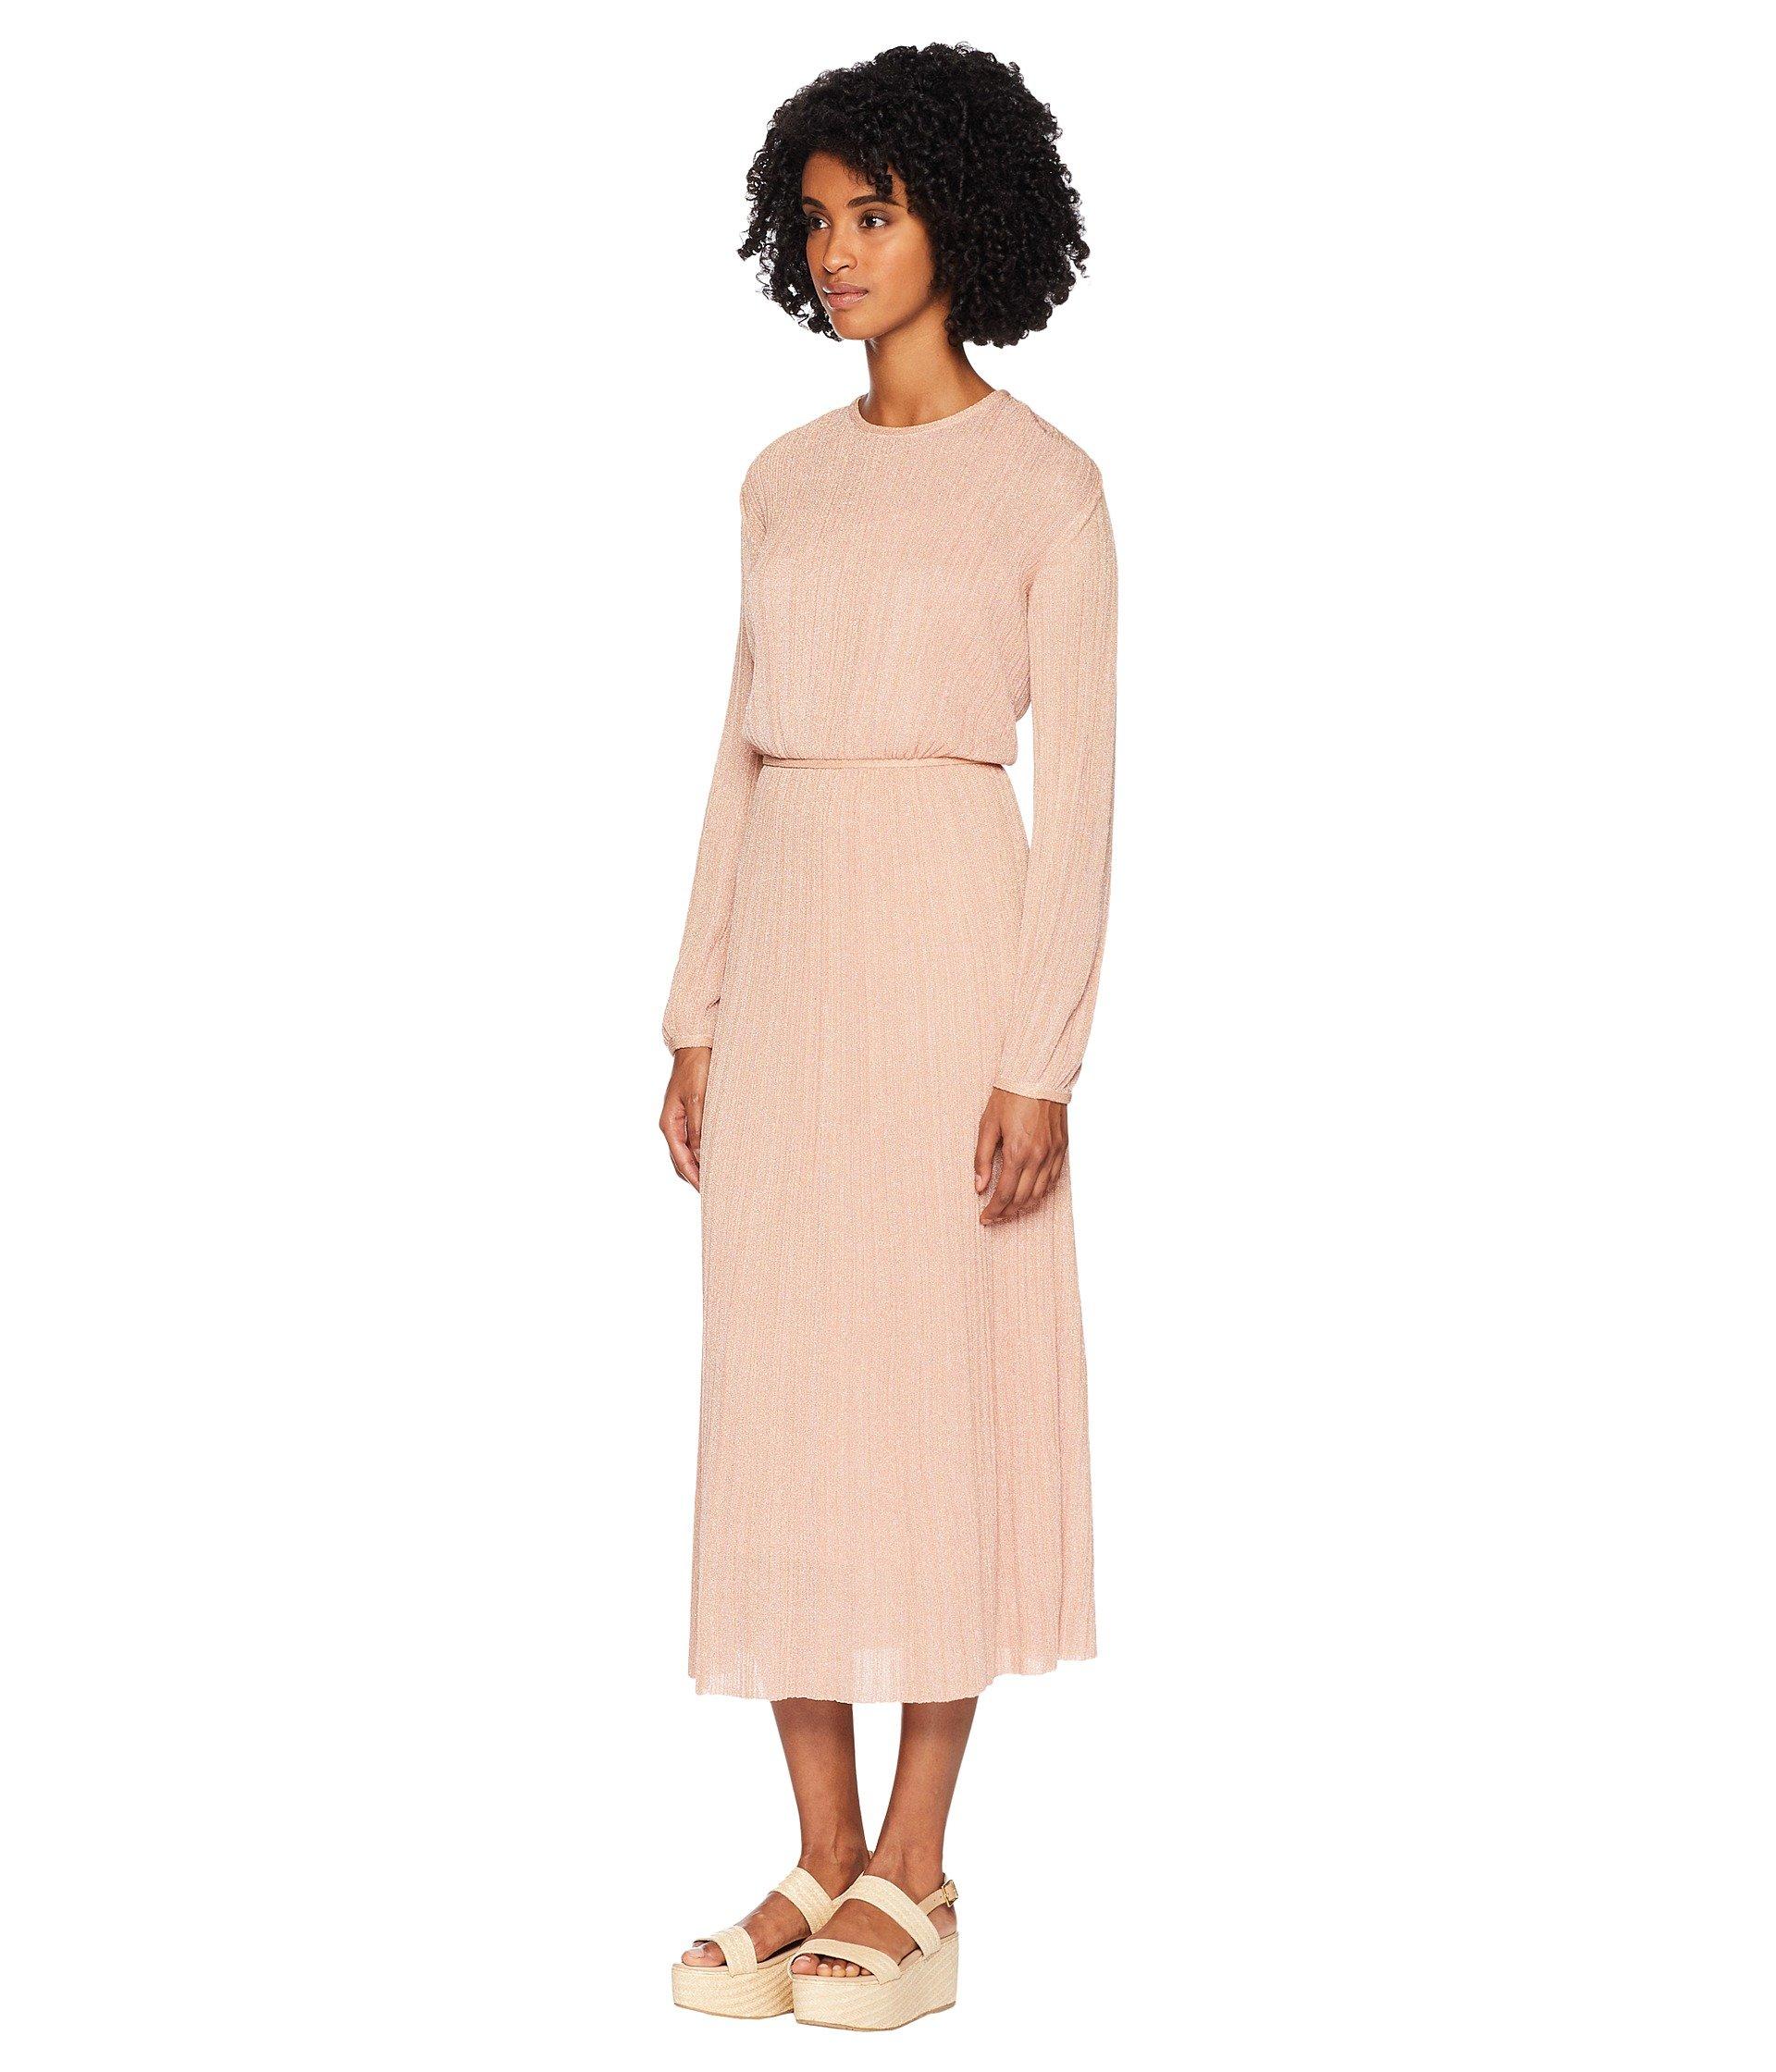 M Missoni Dress Blush Long Plisse Lurex Solid Sleeve fnfqFprW